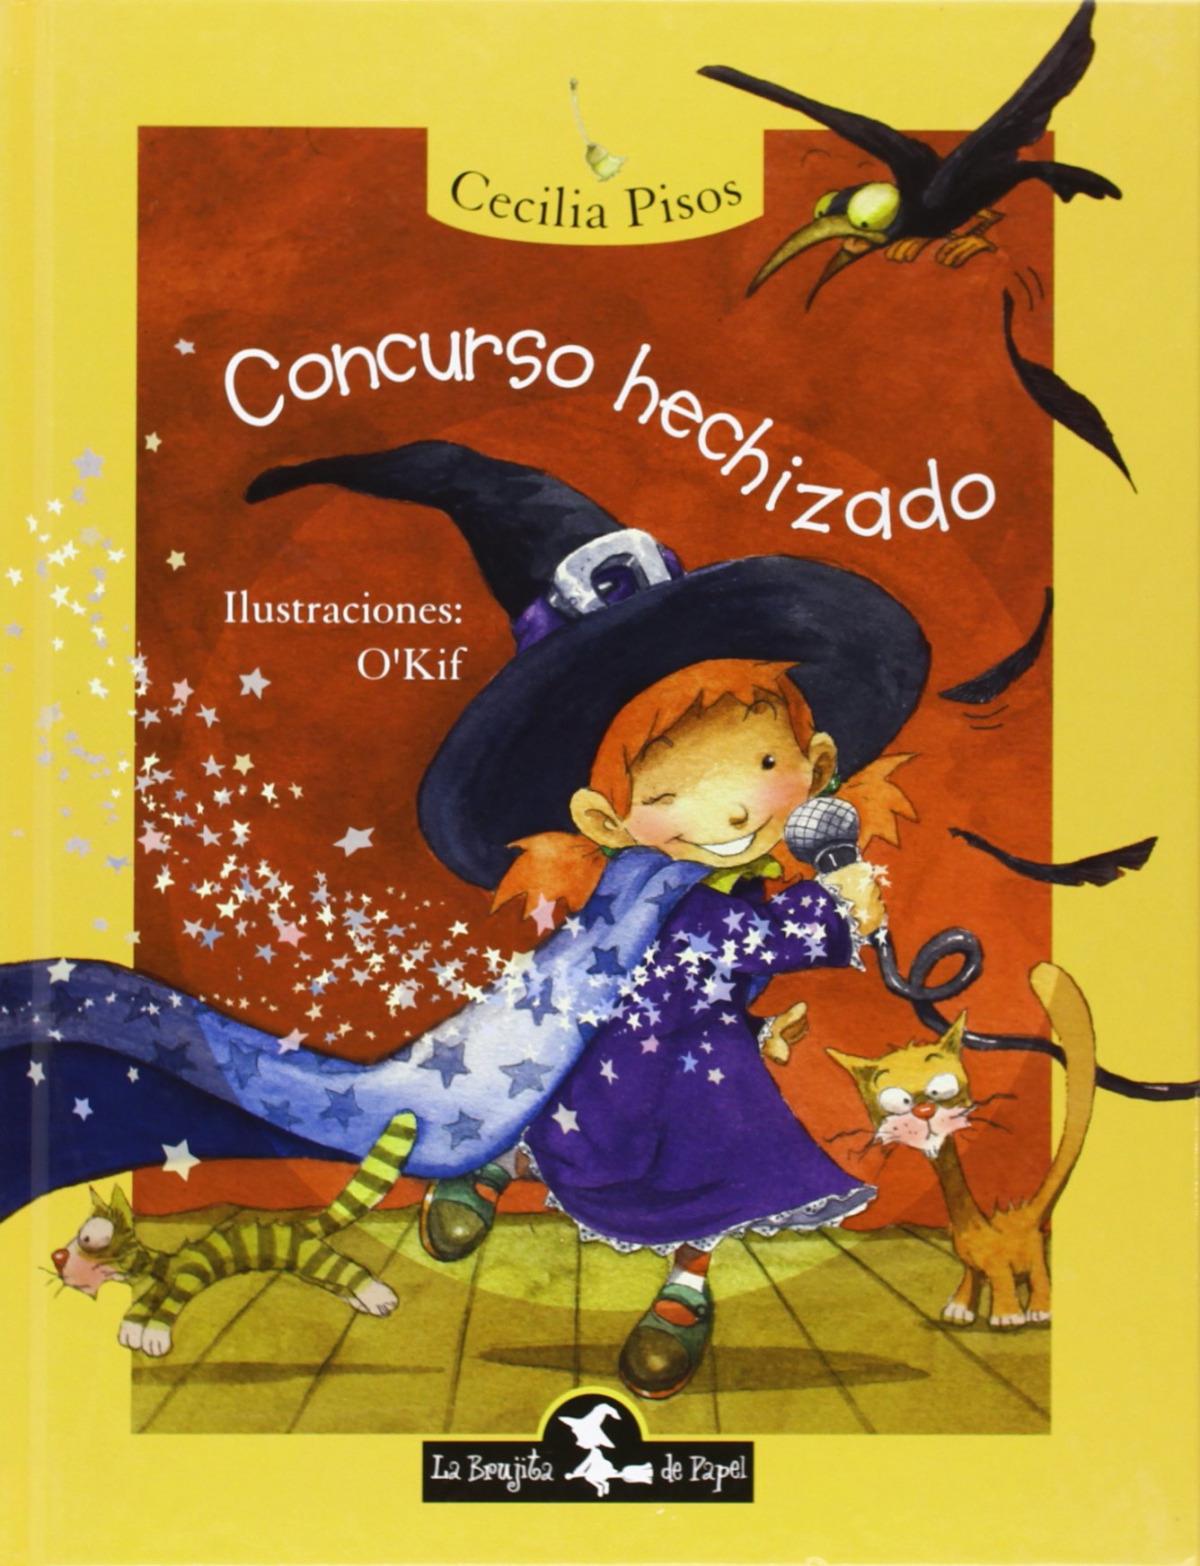 Concurso hechizado - Pisos, Cecilia